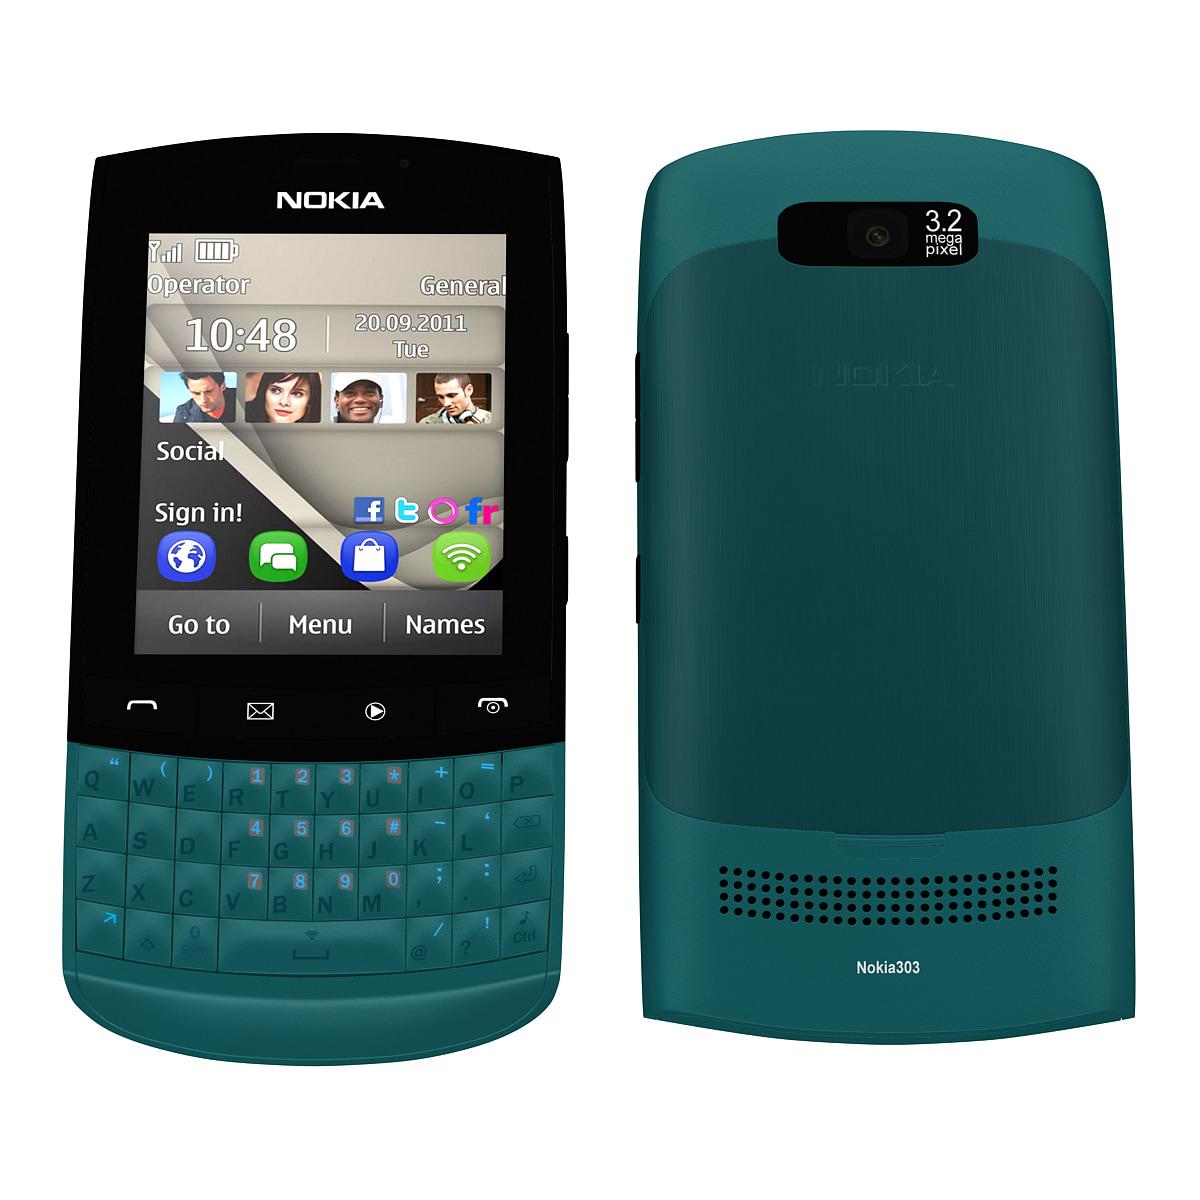 Nokia_Asha_303_Blue_001.jpg